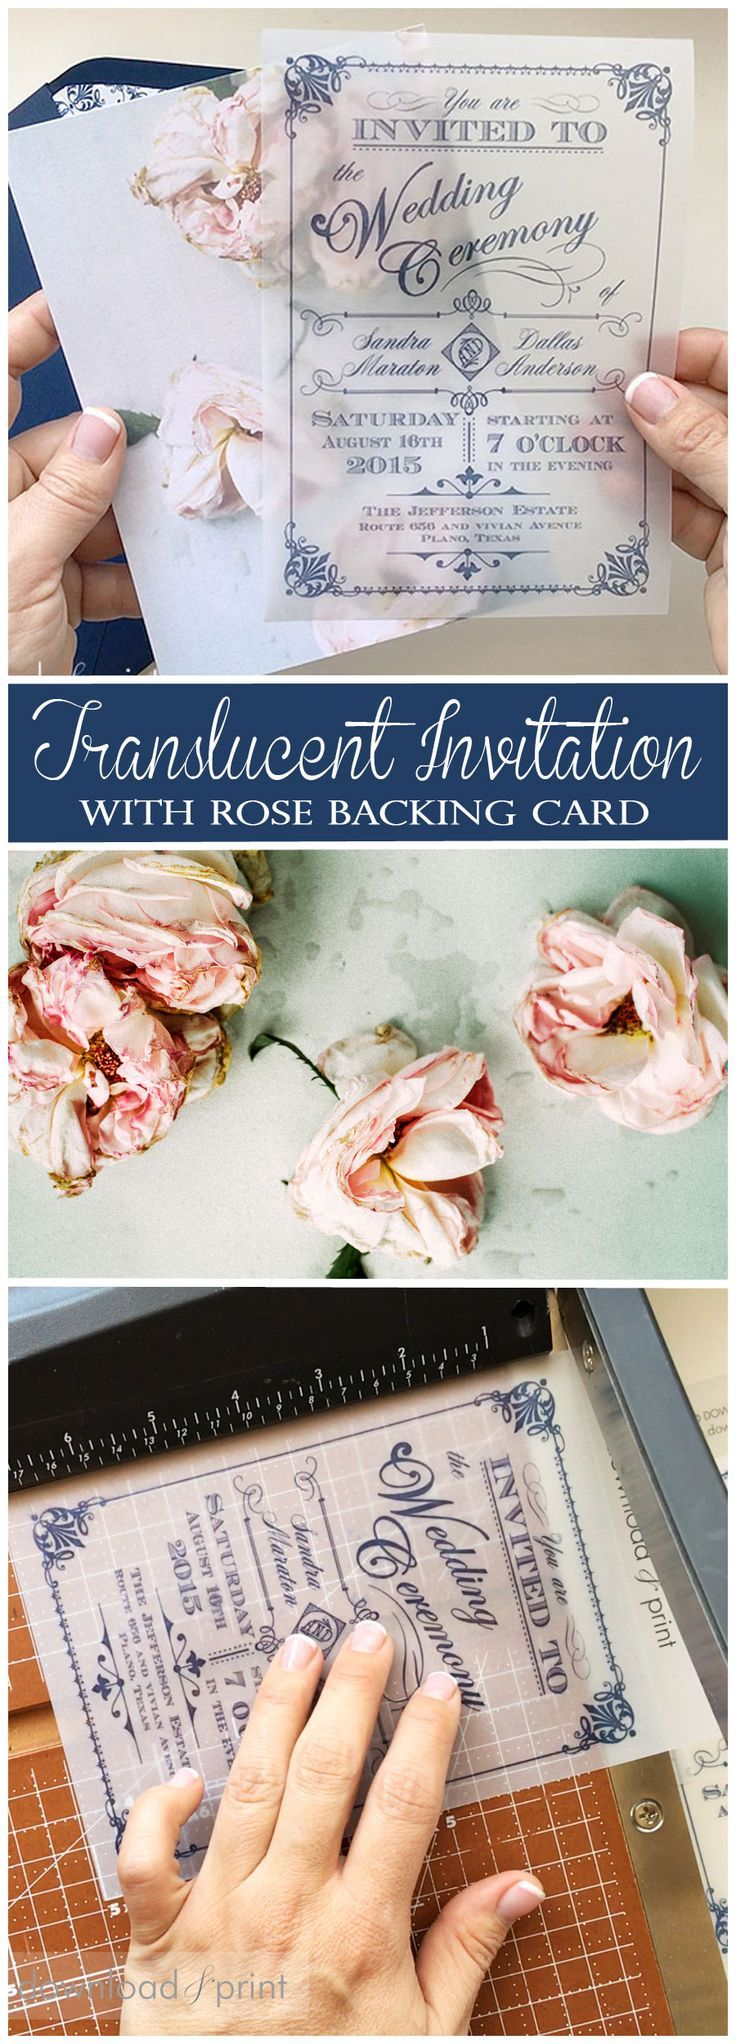 Best 25 Invitation cards ideas on Pinterest Wedding invitation